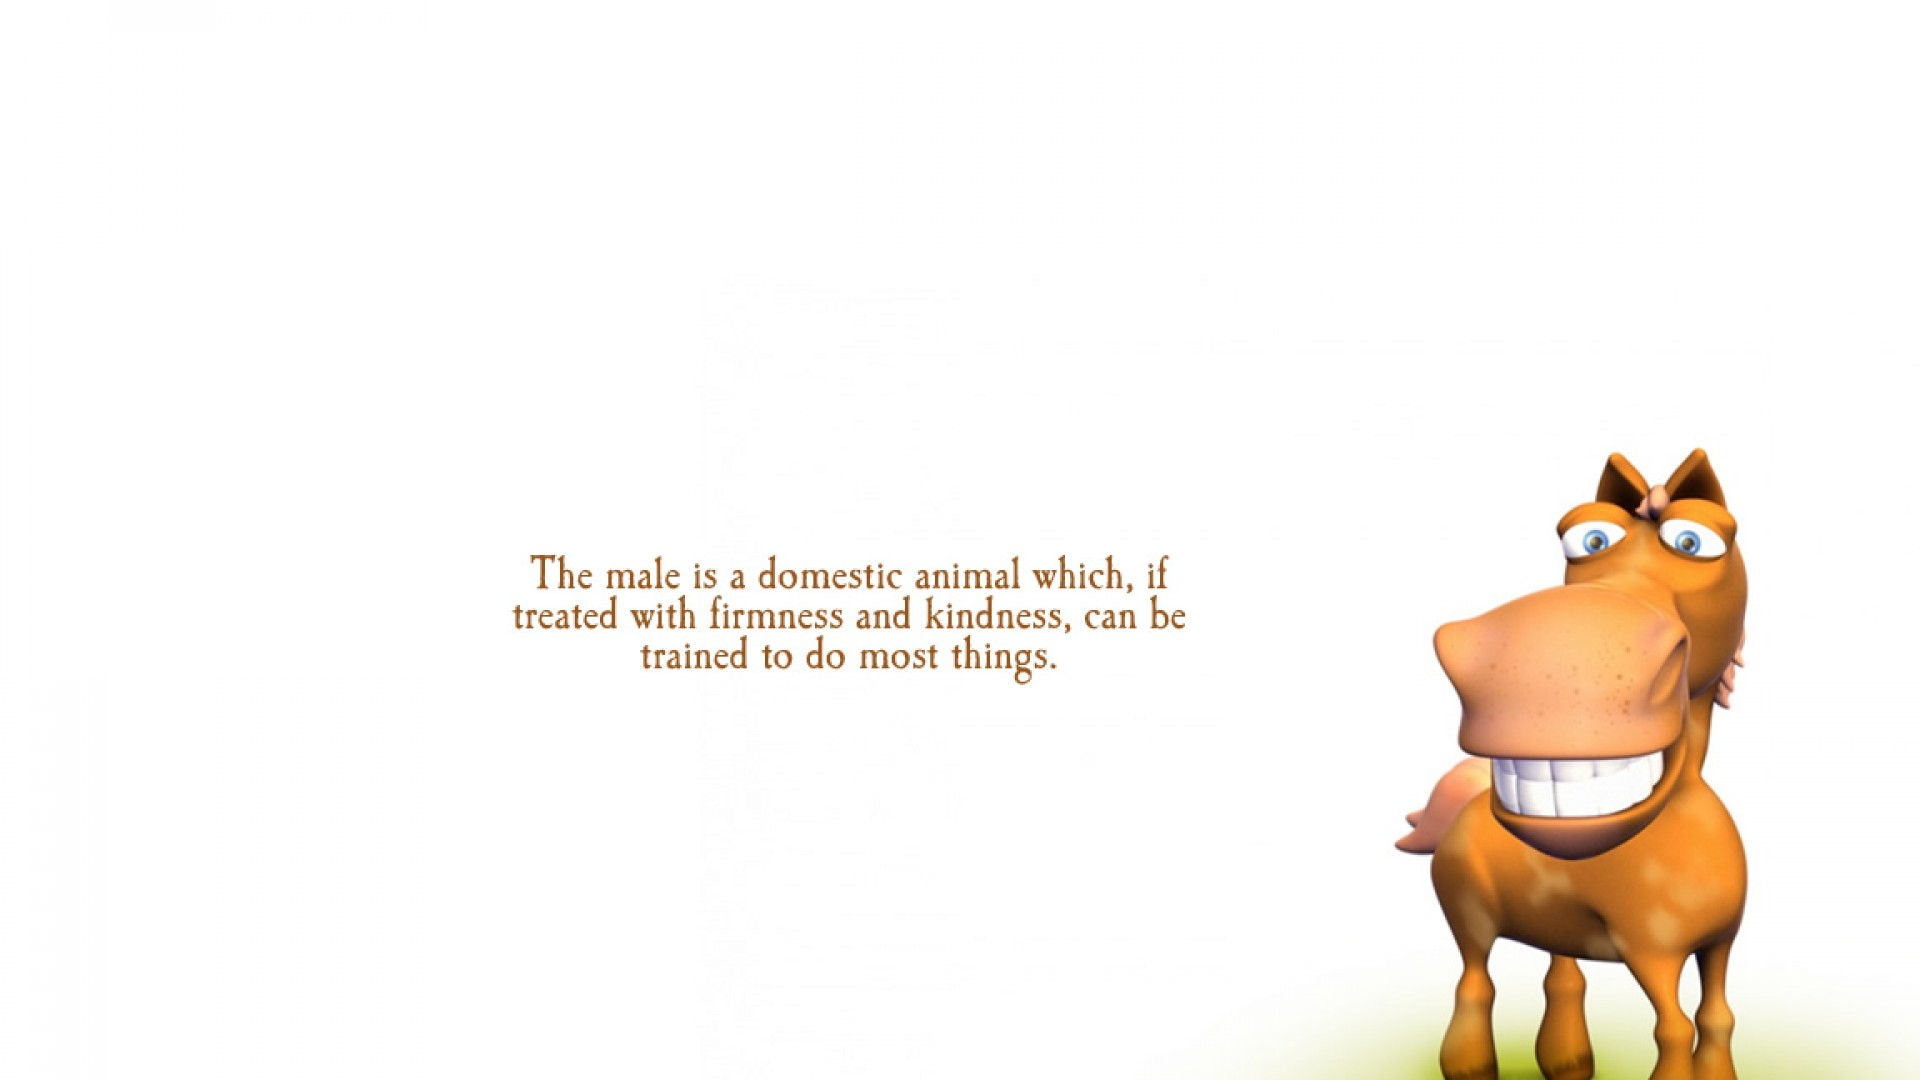 Funny cartoon animals quotes